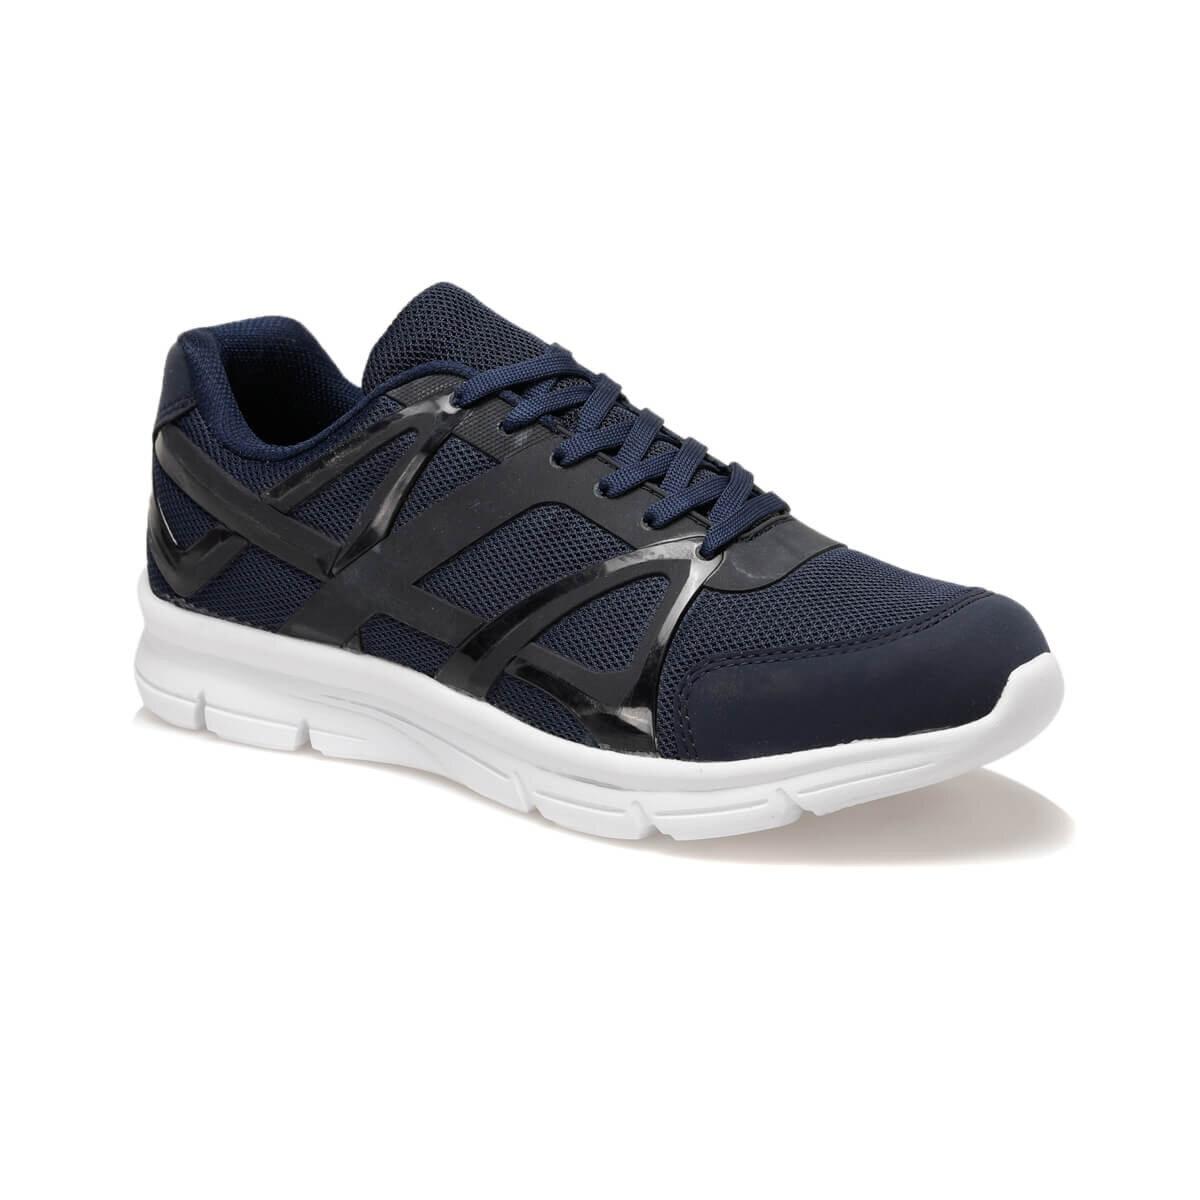 FLO NABEL 9PR Navy Blue Men 'S Sports Shoes Torex